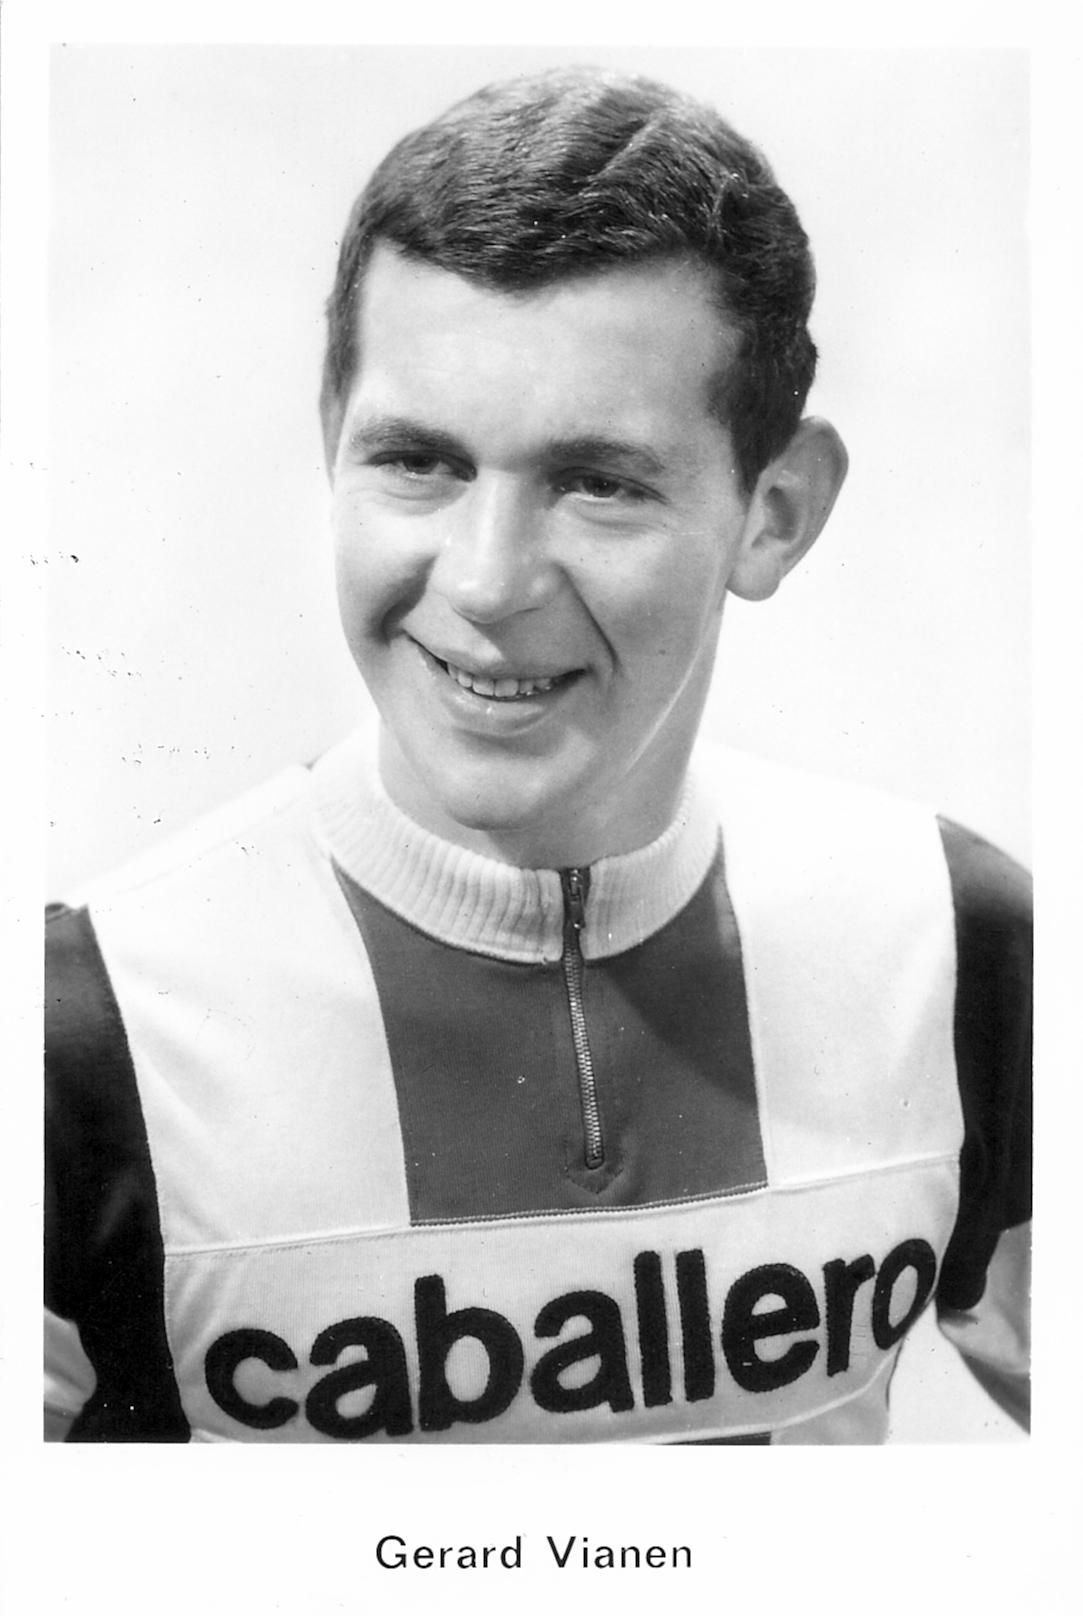 GV_ Portret Caballero '69